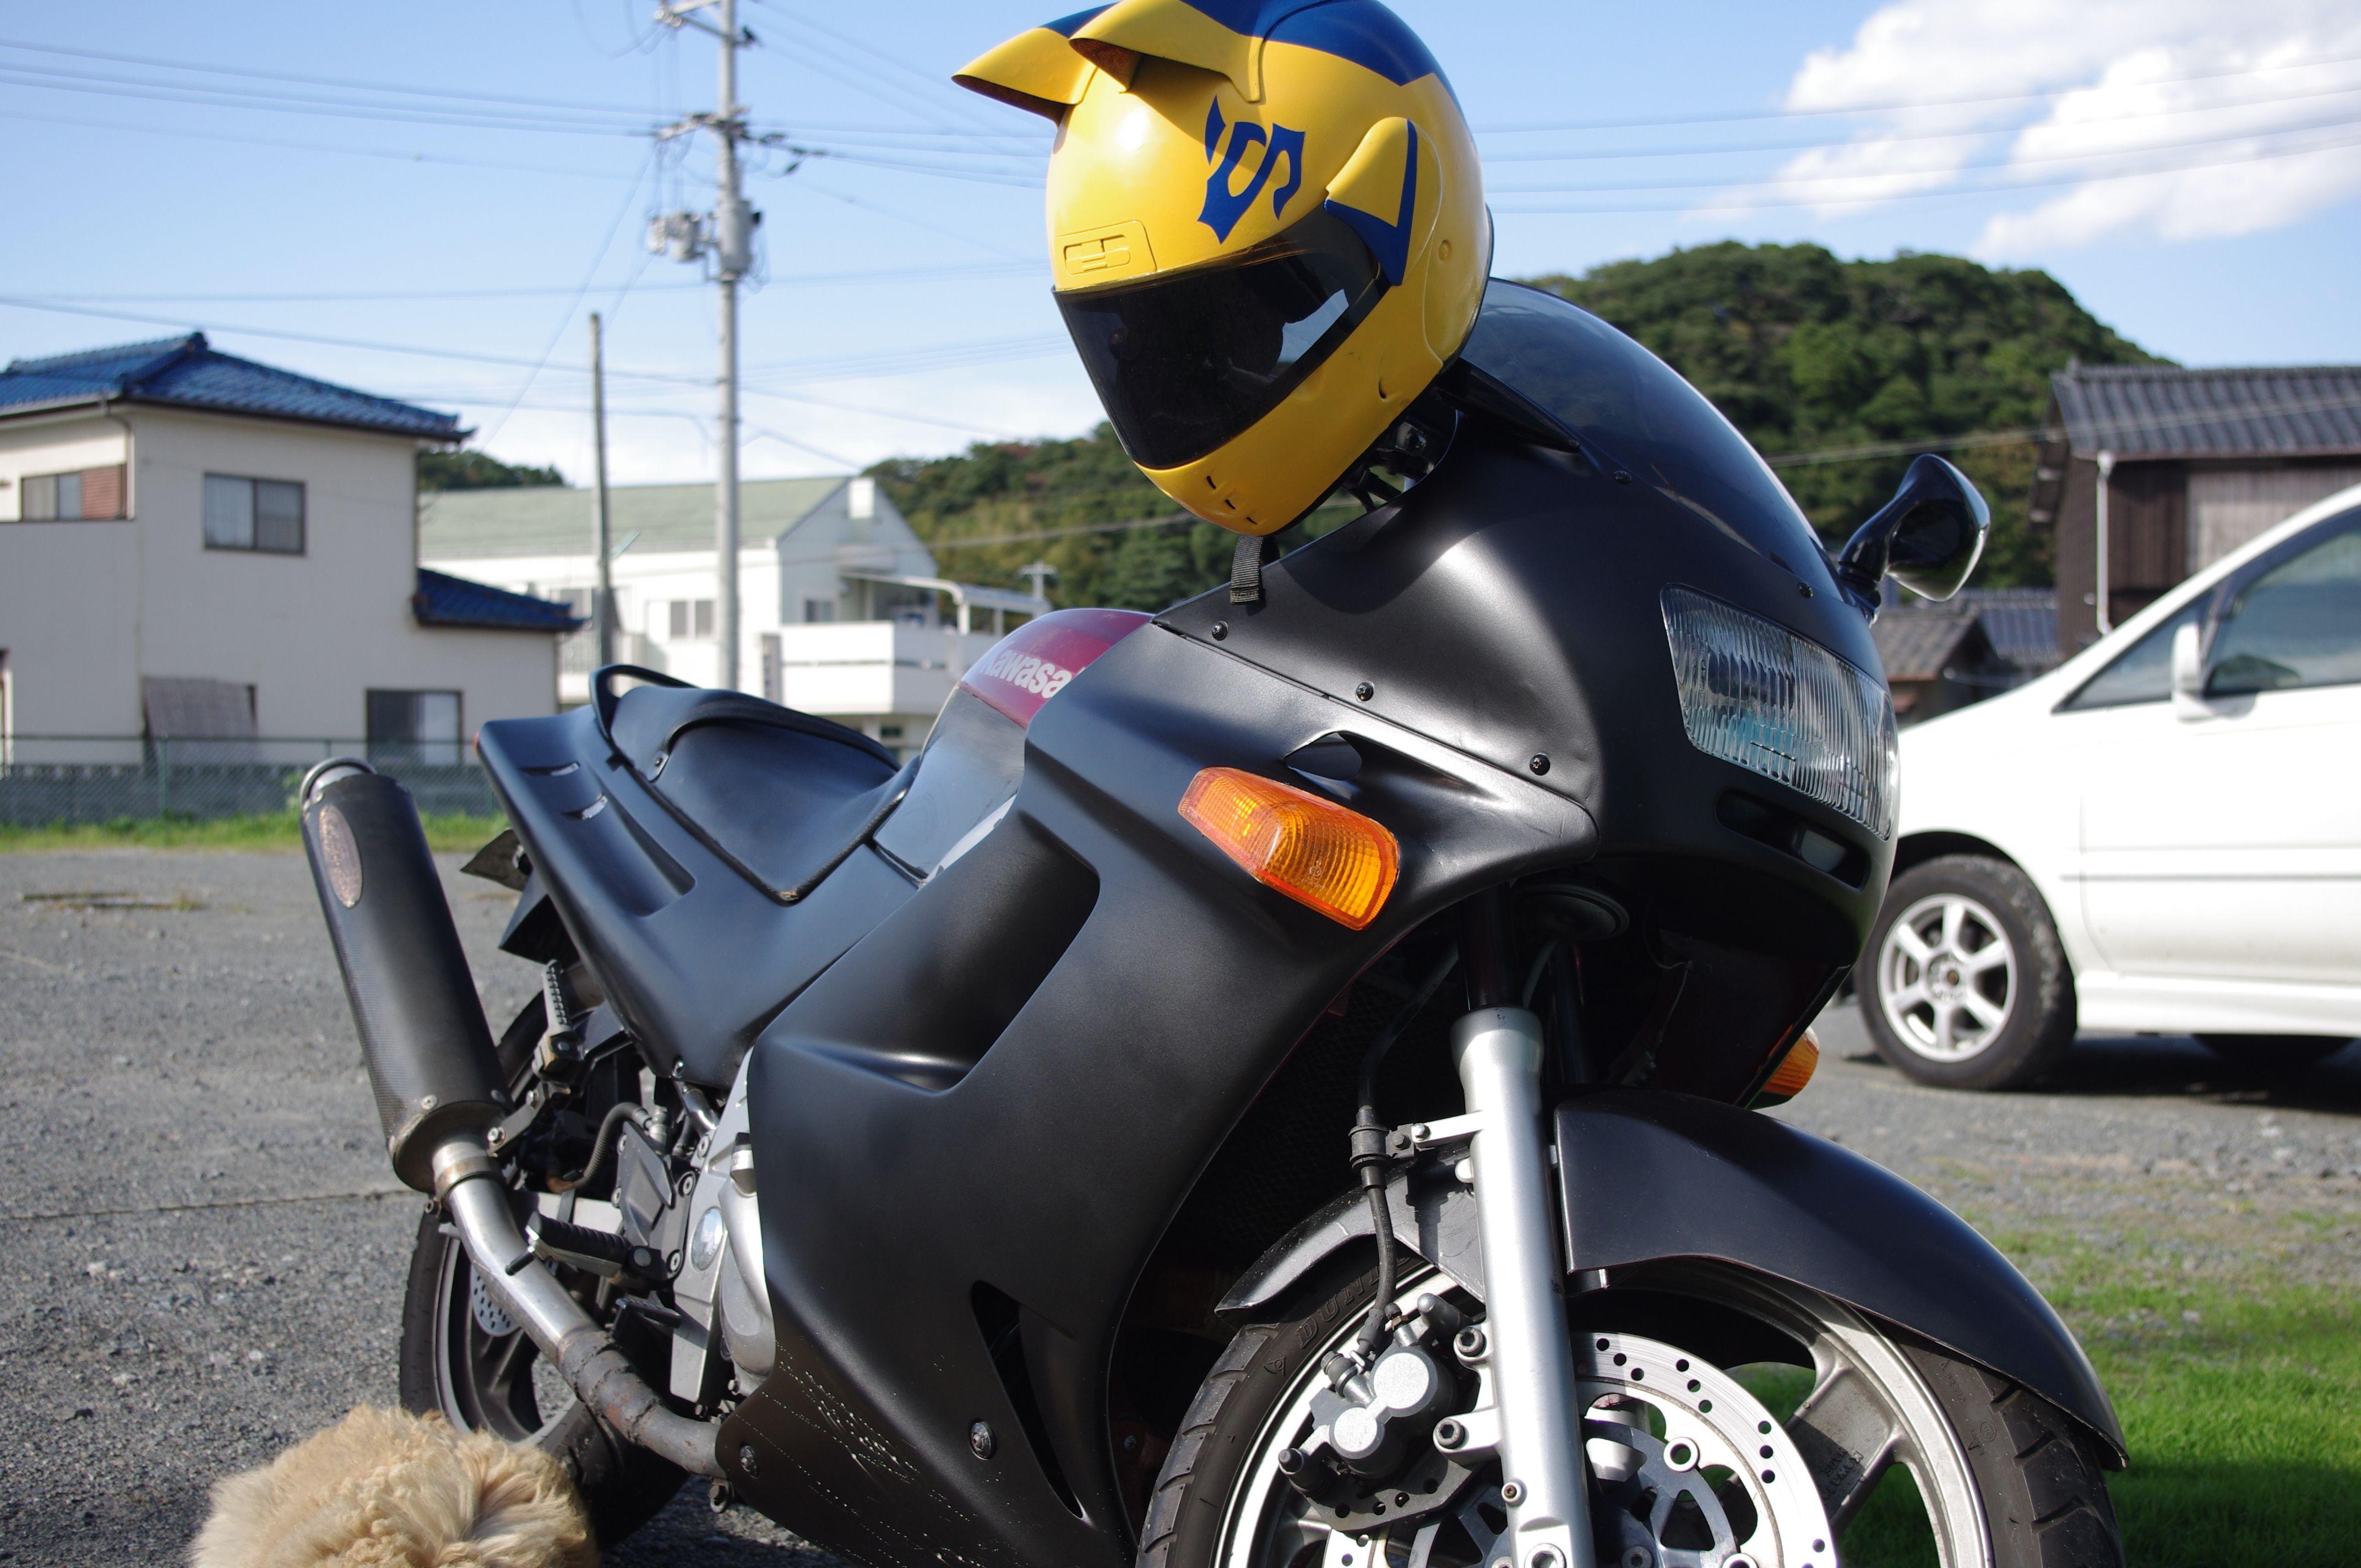 ZZR and DuRaRaRa Celty Sturluson helmet.. Want